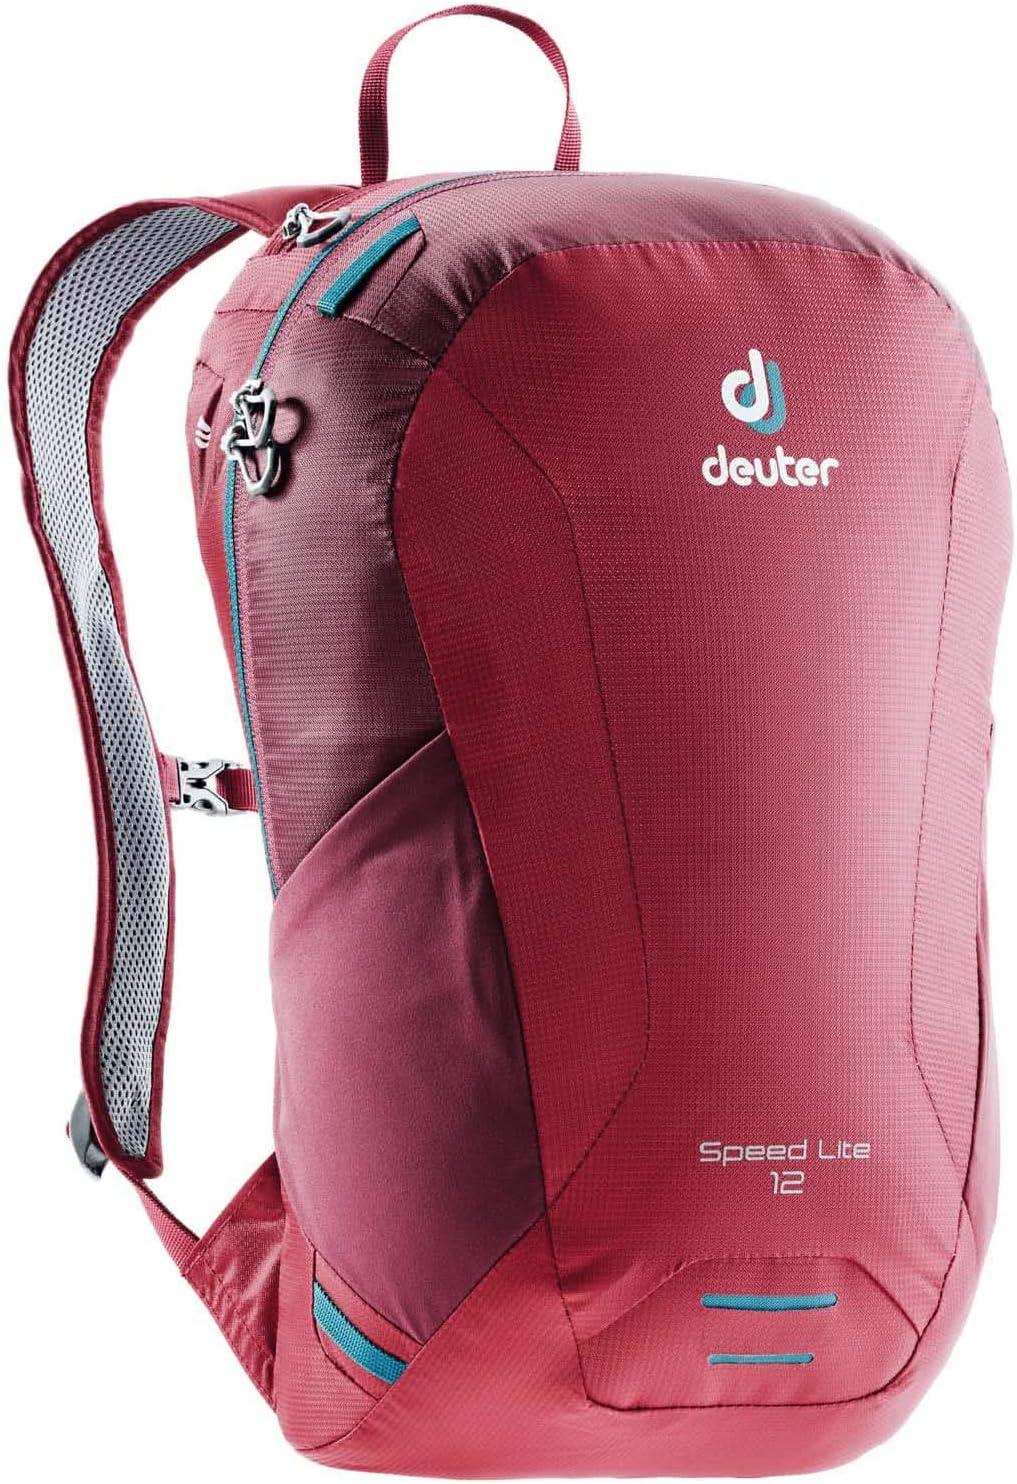 12 /& 16 Liter Capacity Deuter Speed Lite Hiking Daypack with Detachable Waistbelt